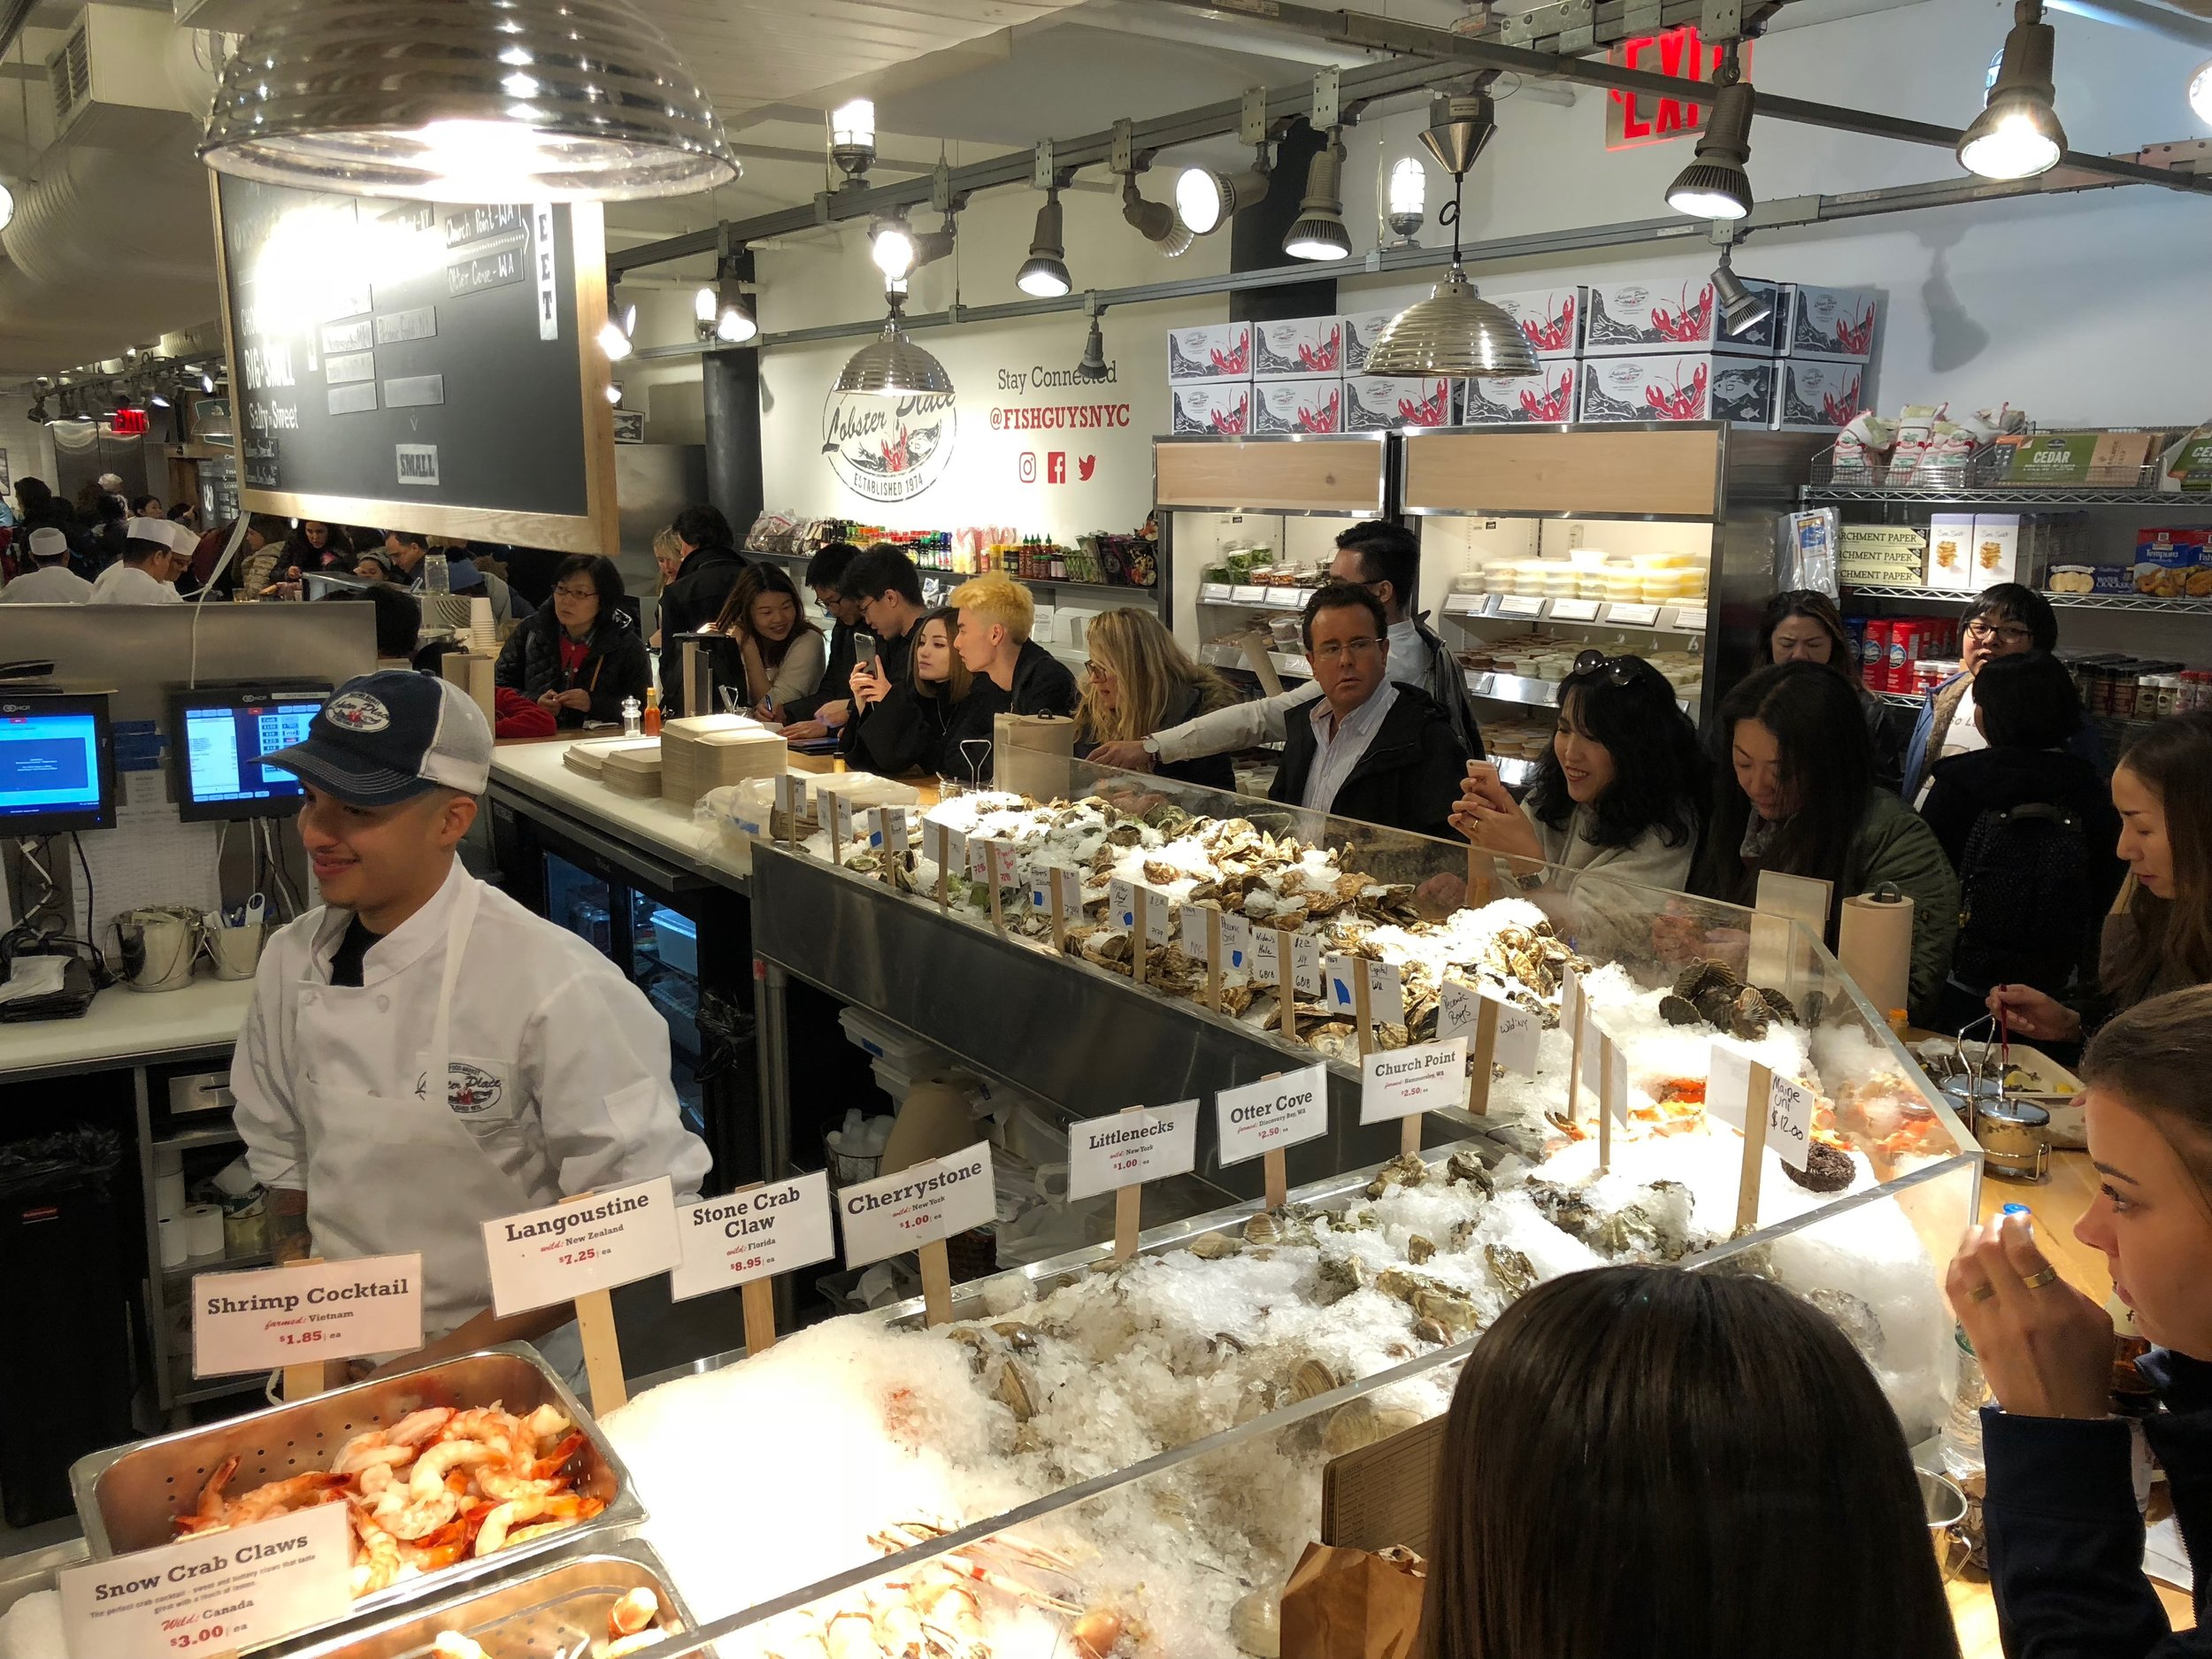 Chelsea Market on meethaha.com